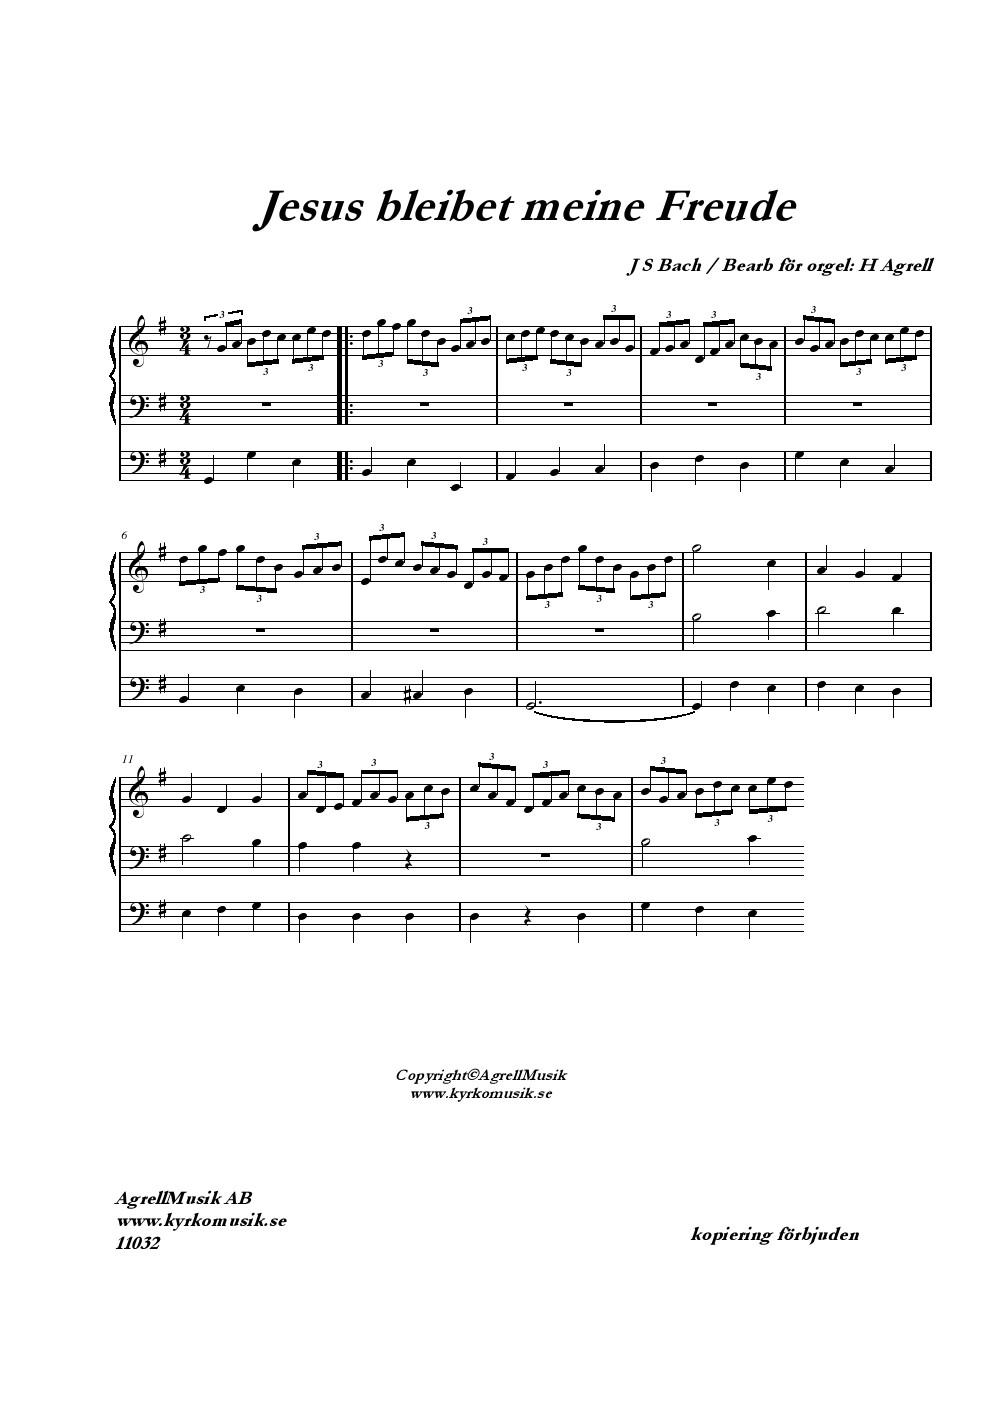 bach jesus bleibet meine freude orgel